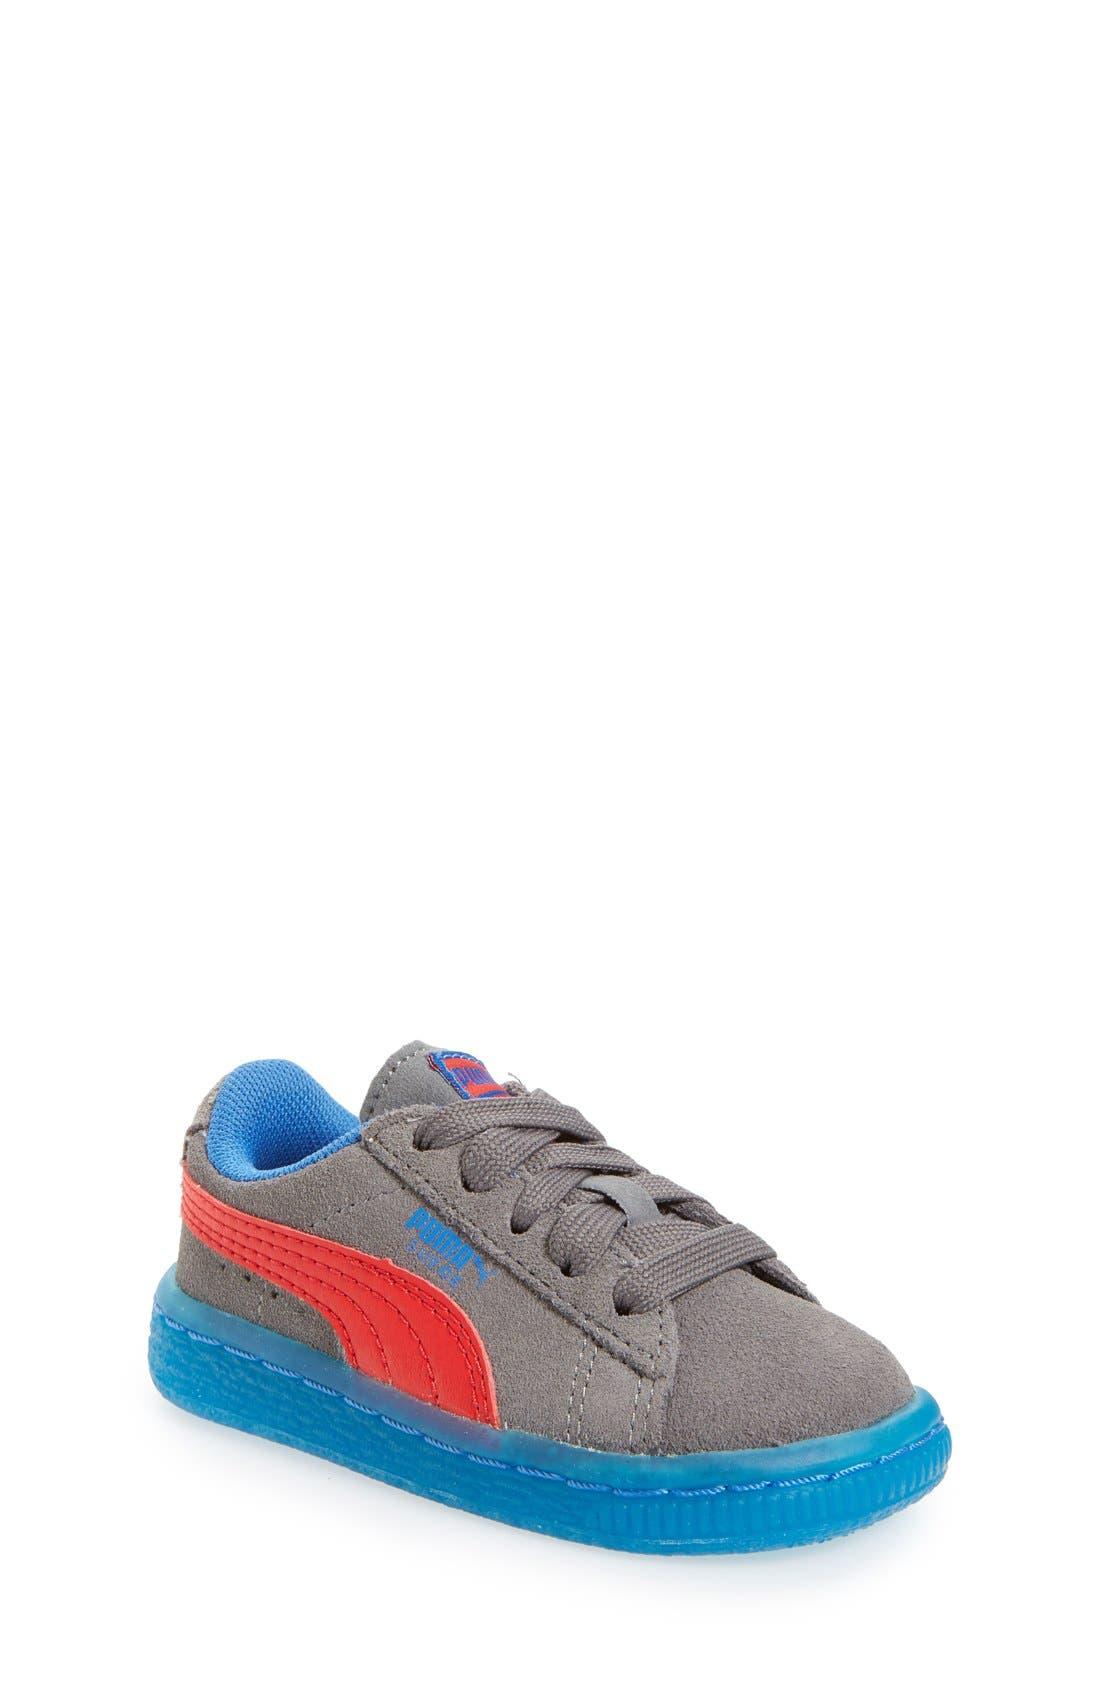 PUMA Iced Sneaker (Baby, Walker & Toddler)